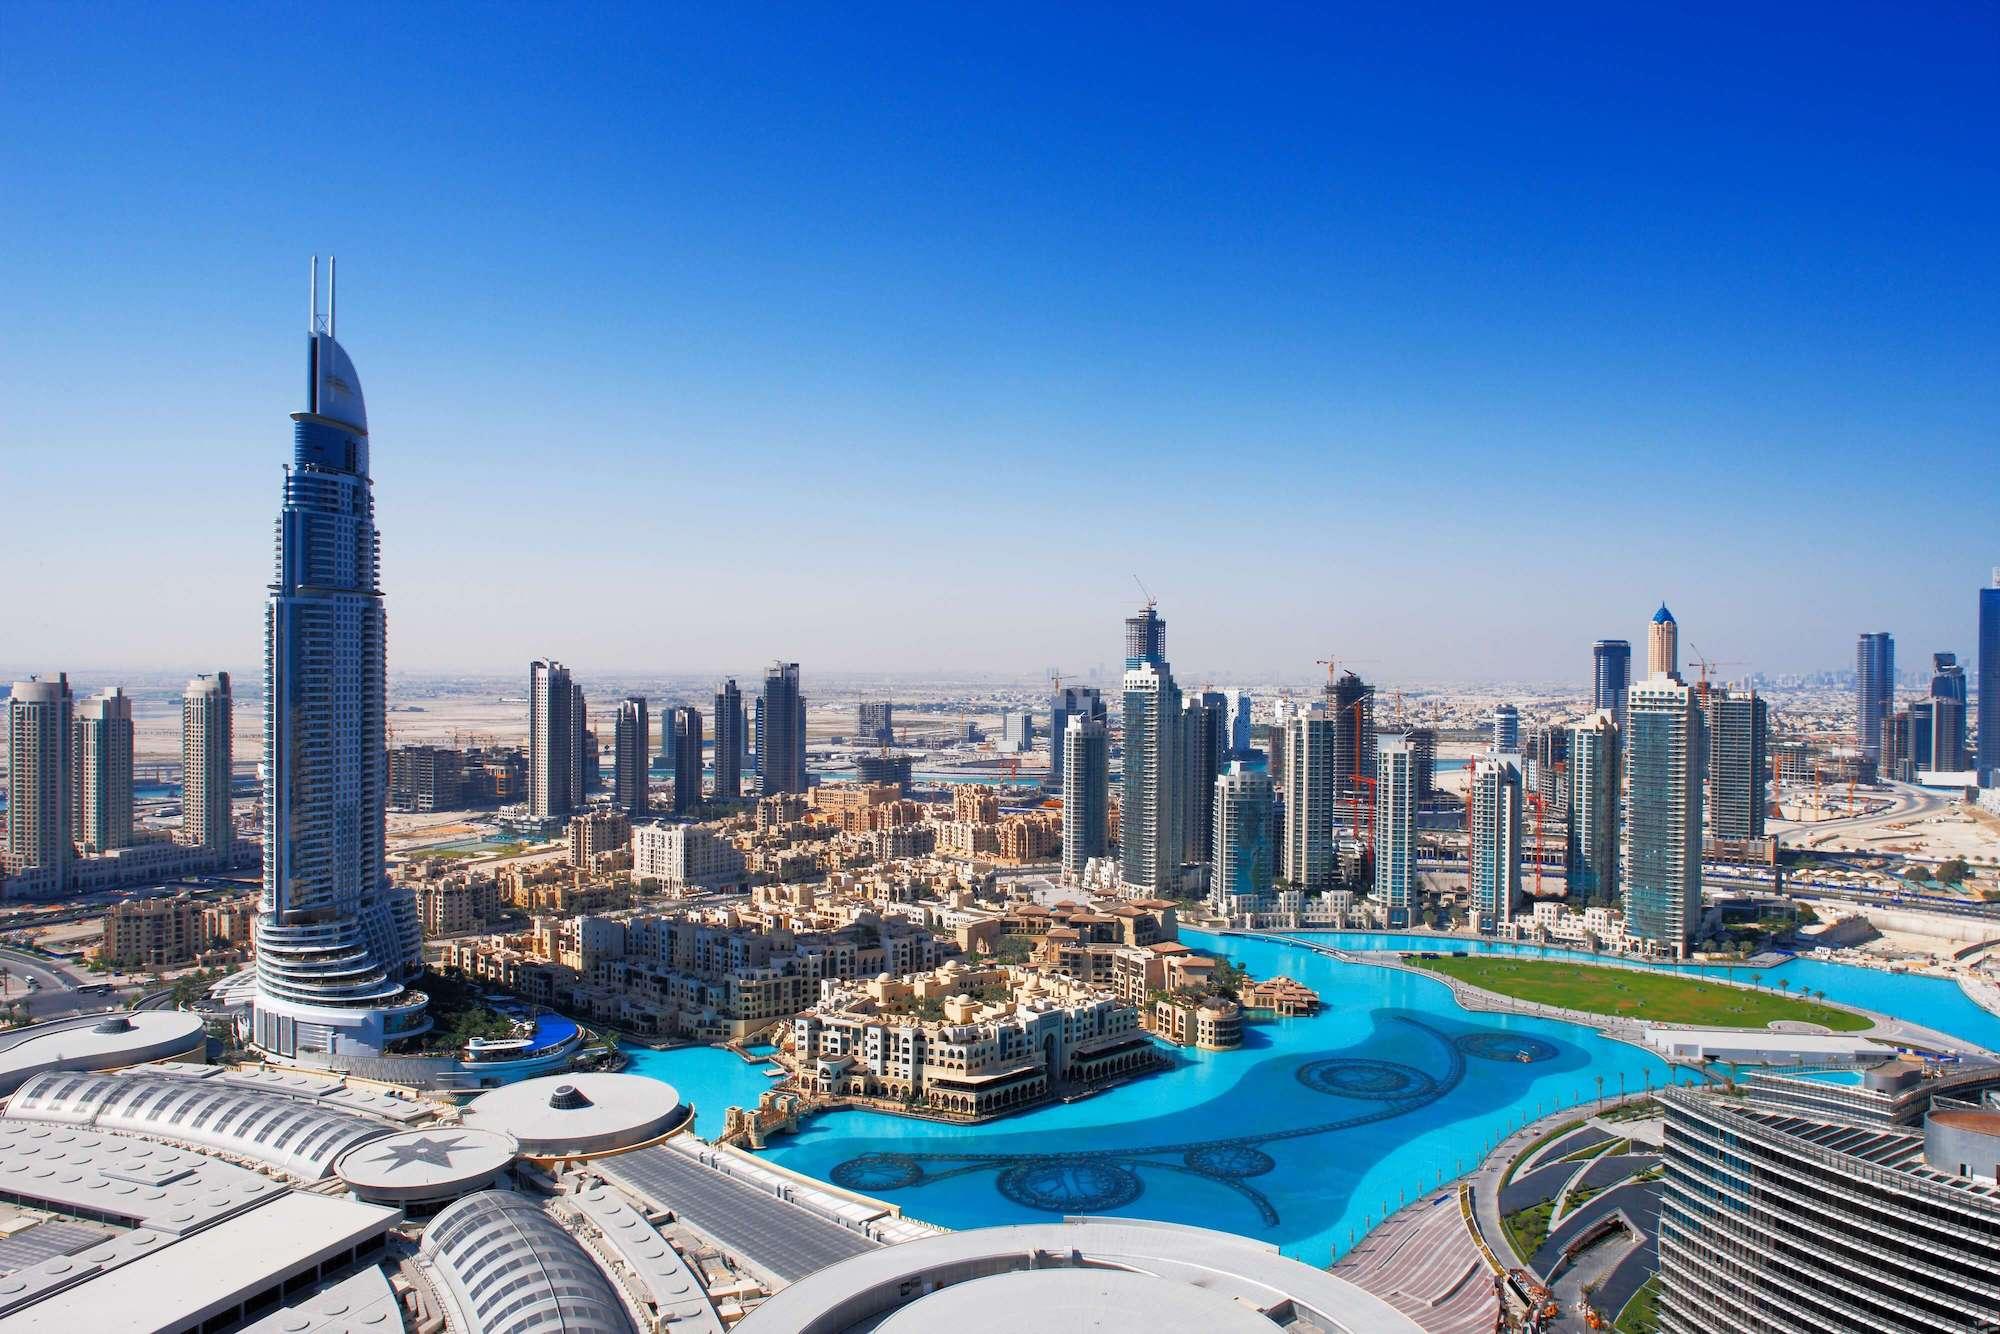 Amwaj Rotana Jumeirah Beach Hotel View